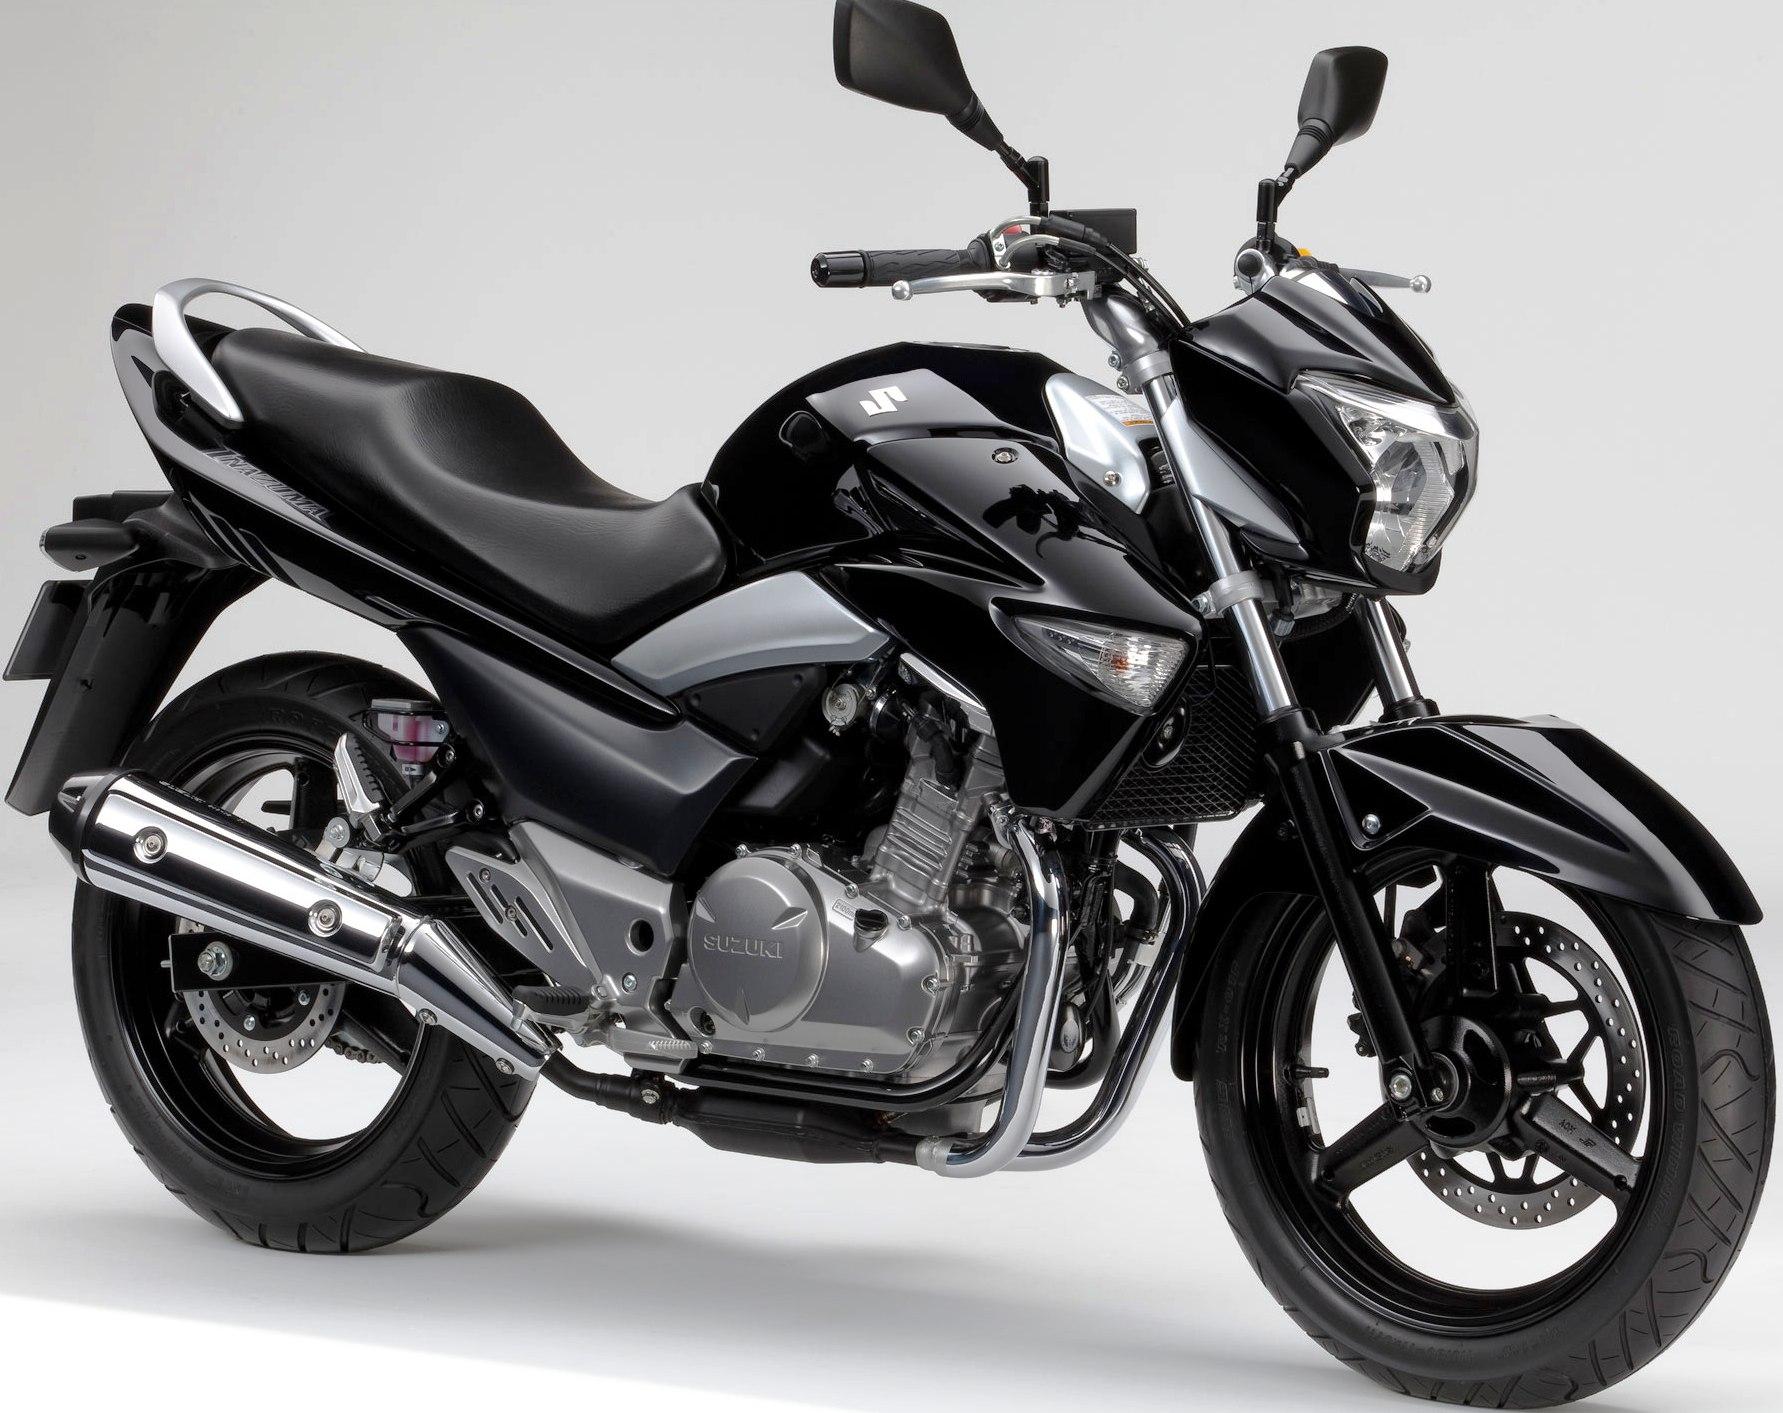 Spesifikasi dan Harga Suzuki Inazuma 250 Terbaru November 2014